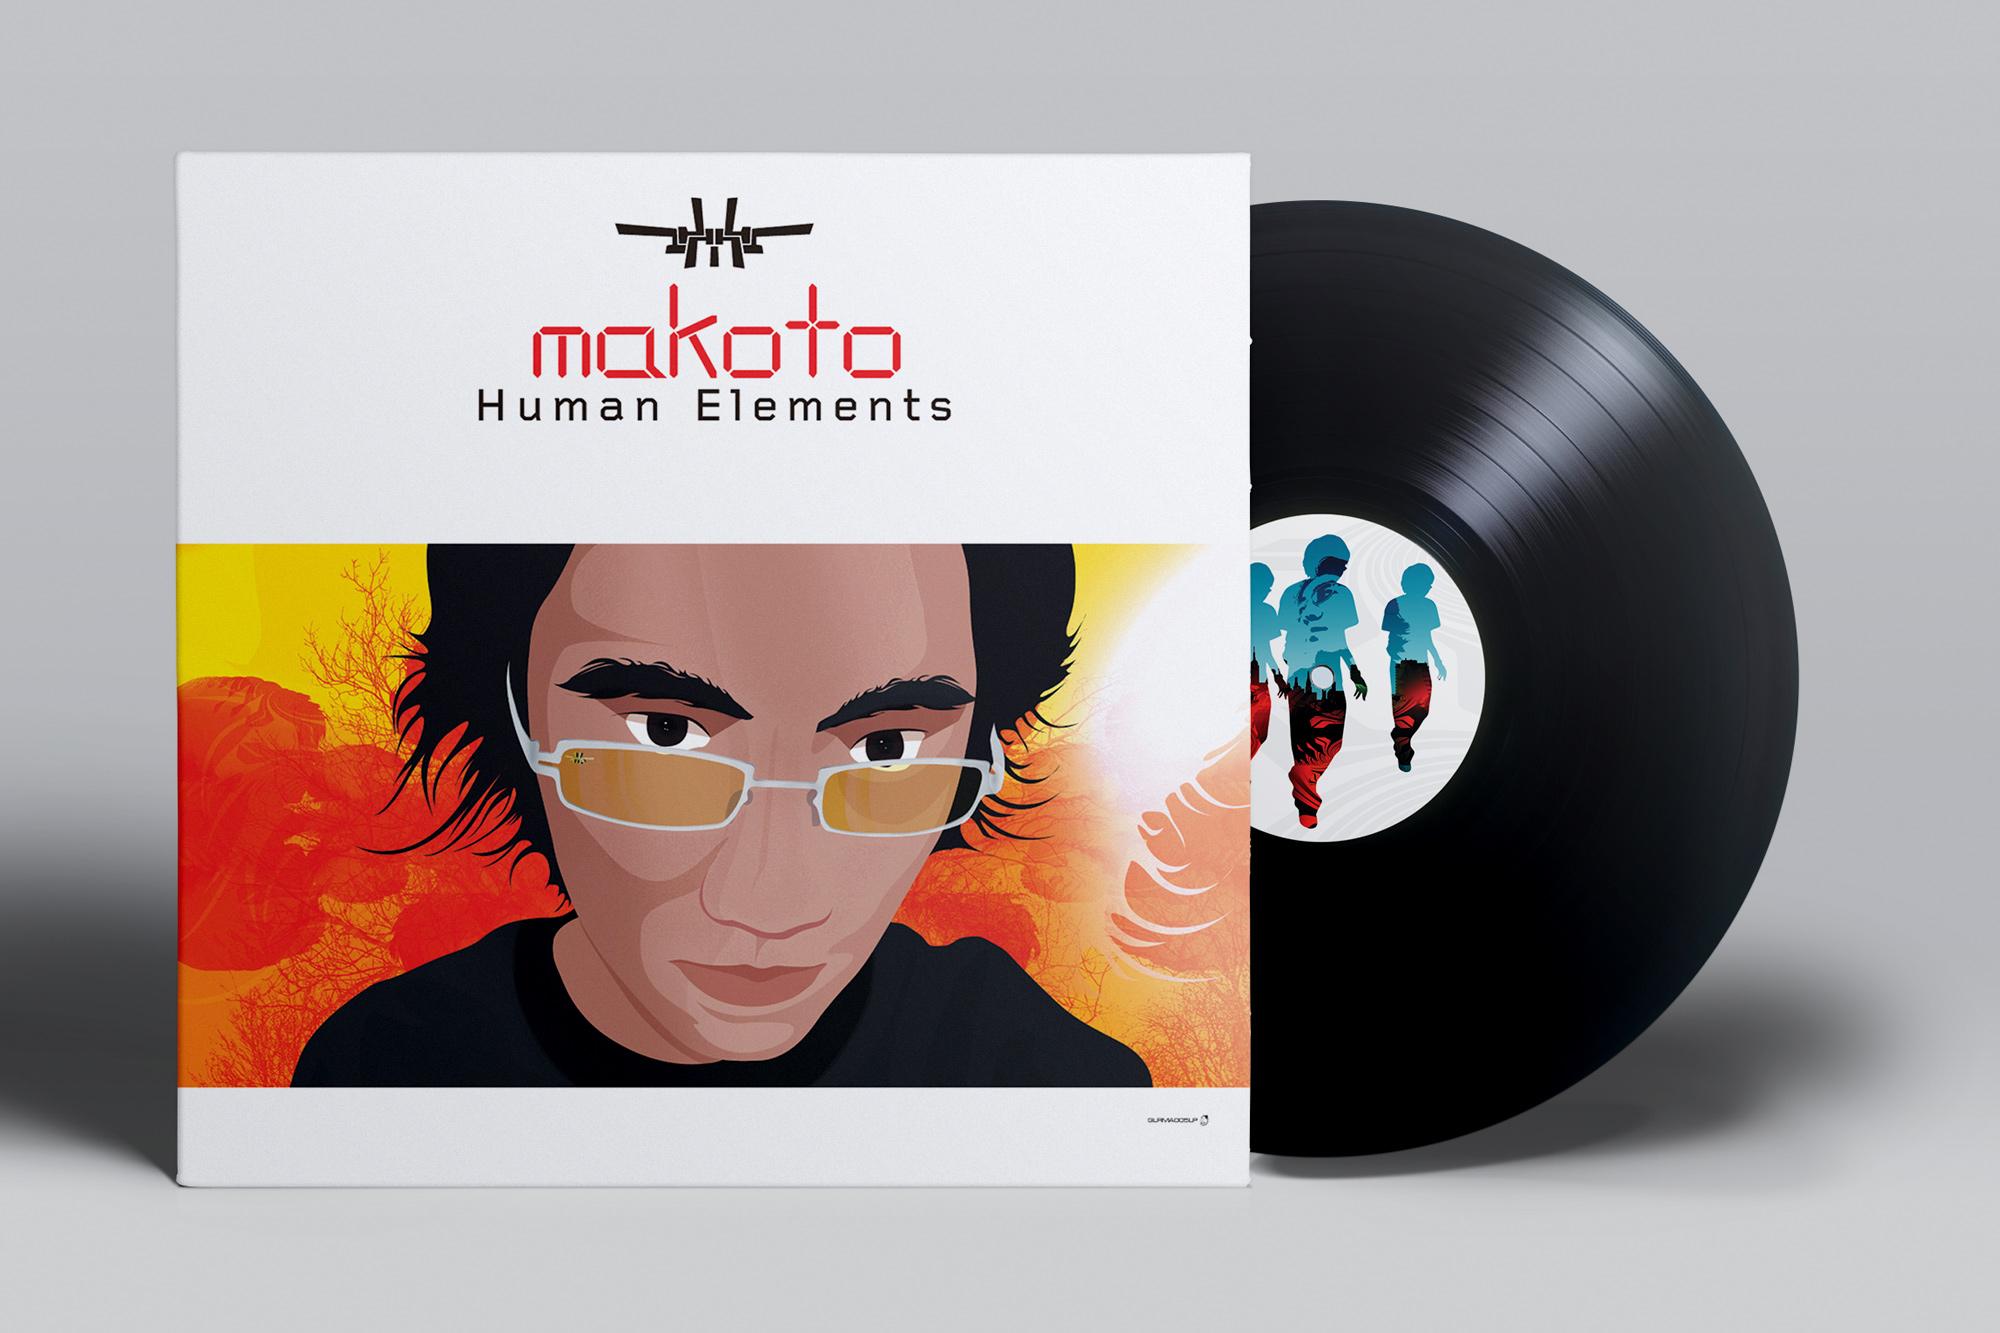 gpj-studio-glr-makoto-human-elements-05